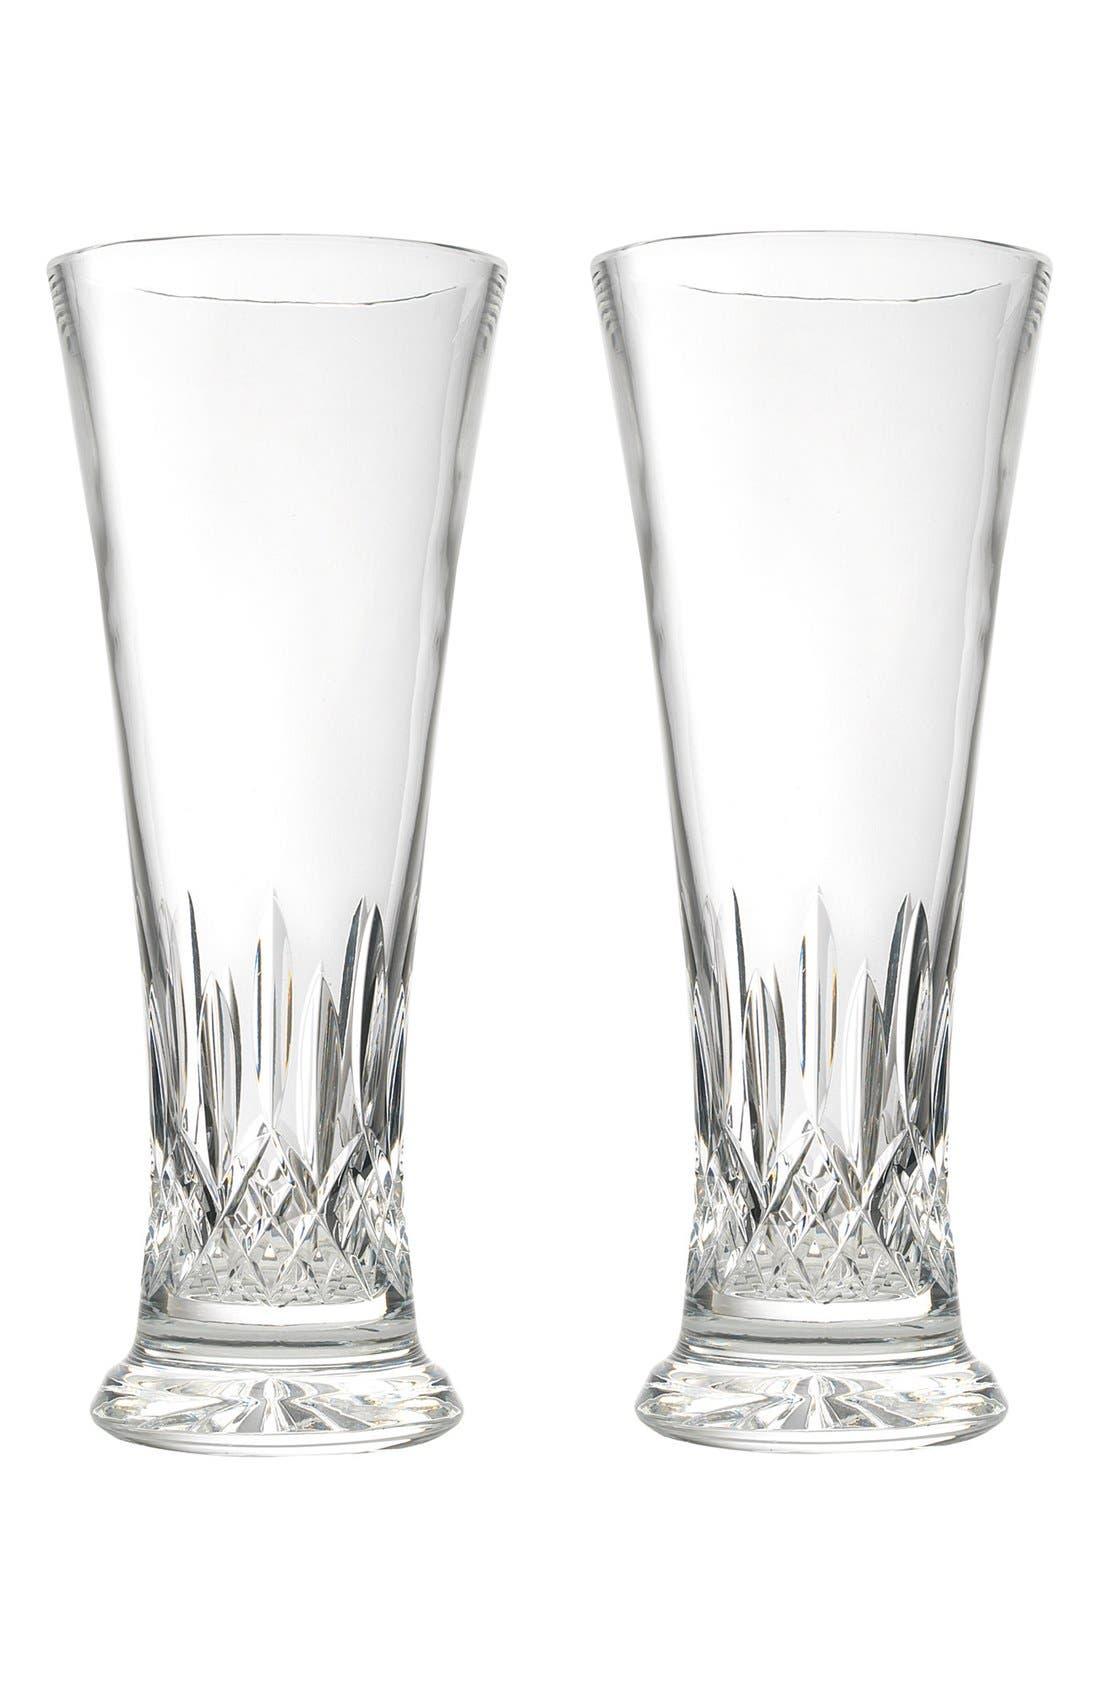 Waterford 'Lismore' Lead Crystal Pilsner Glasses (Set of 2)